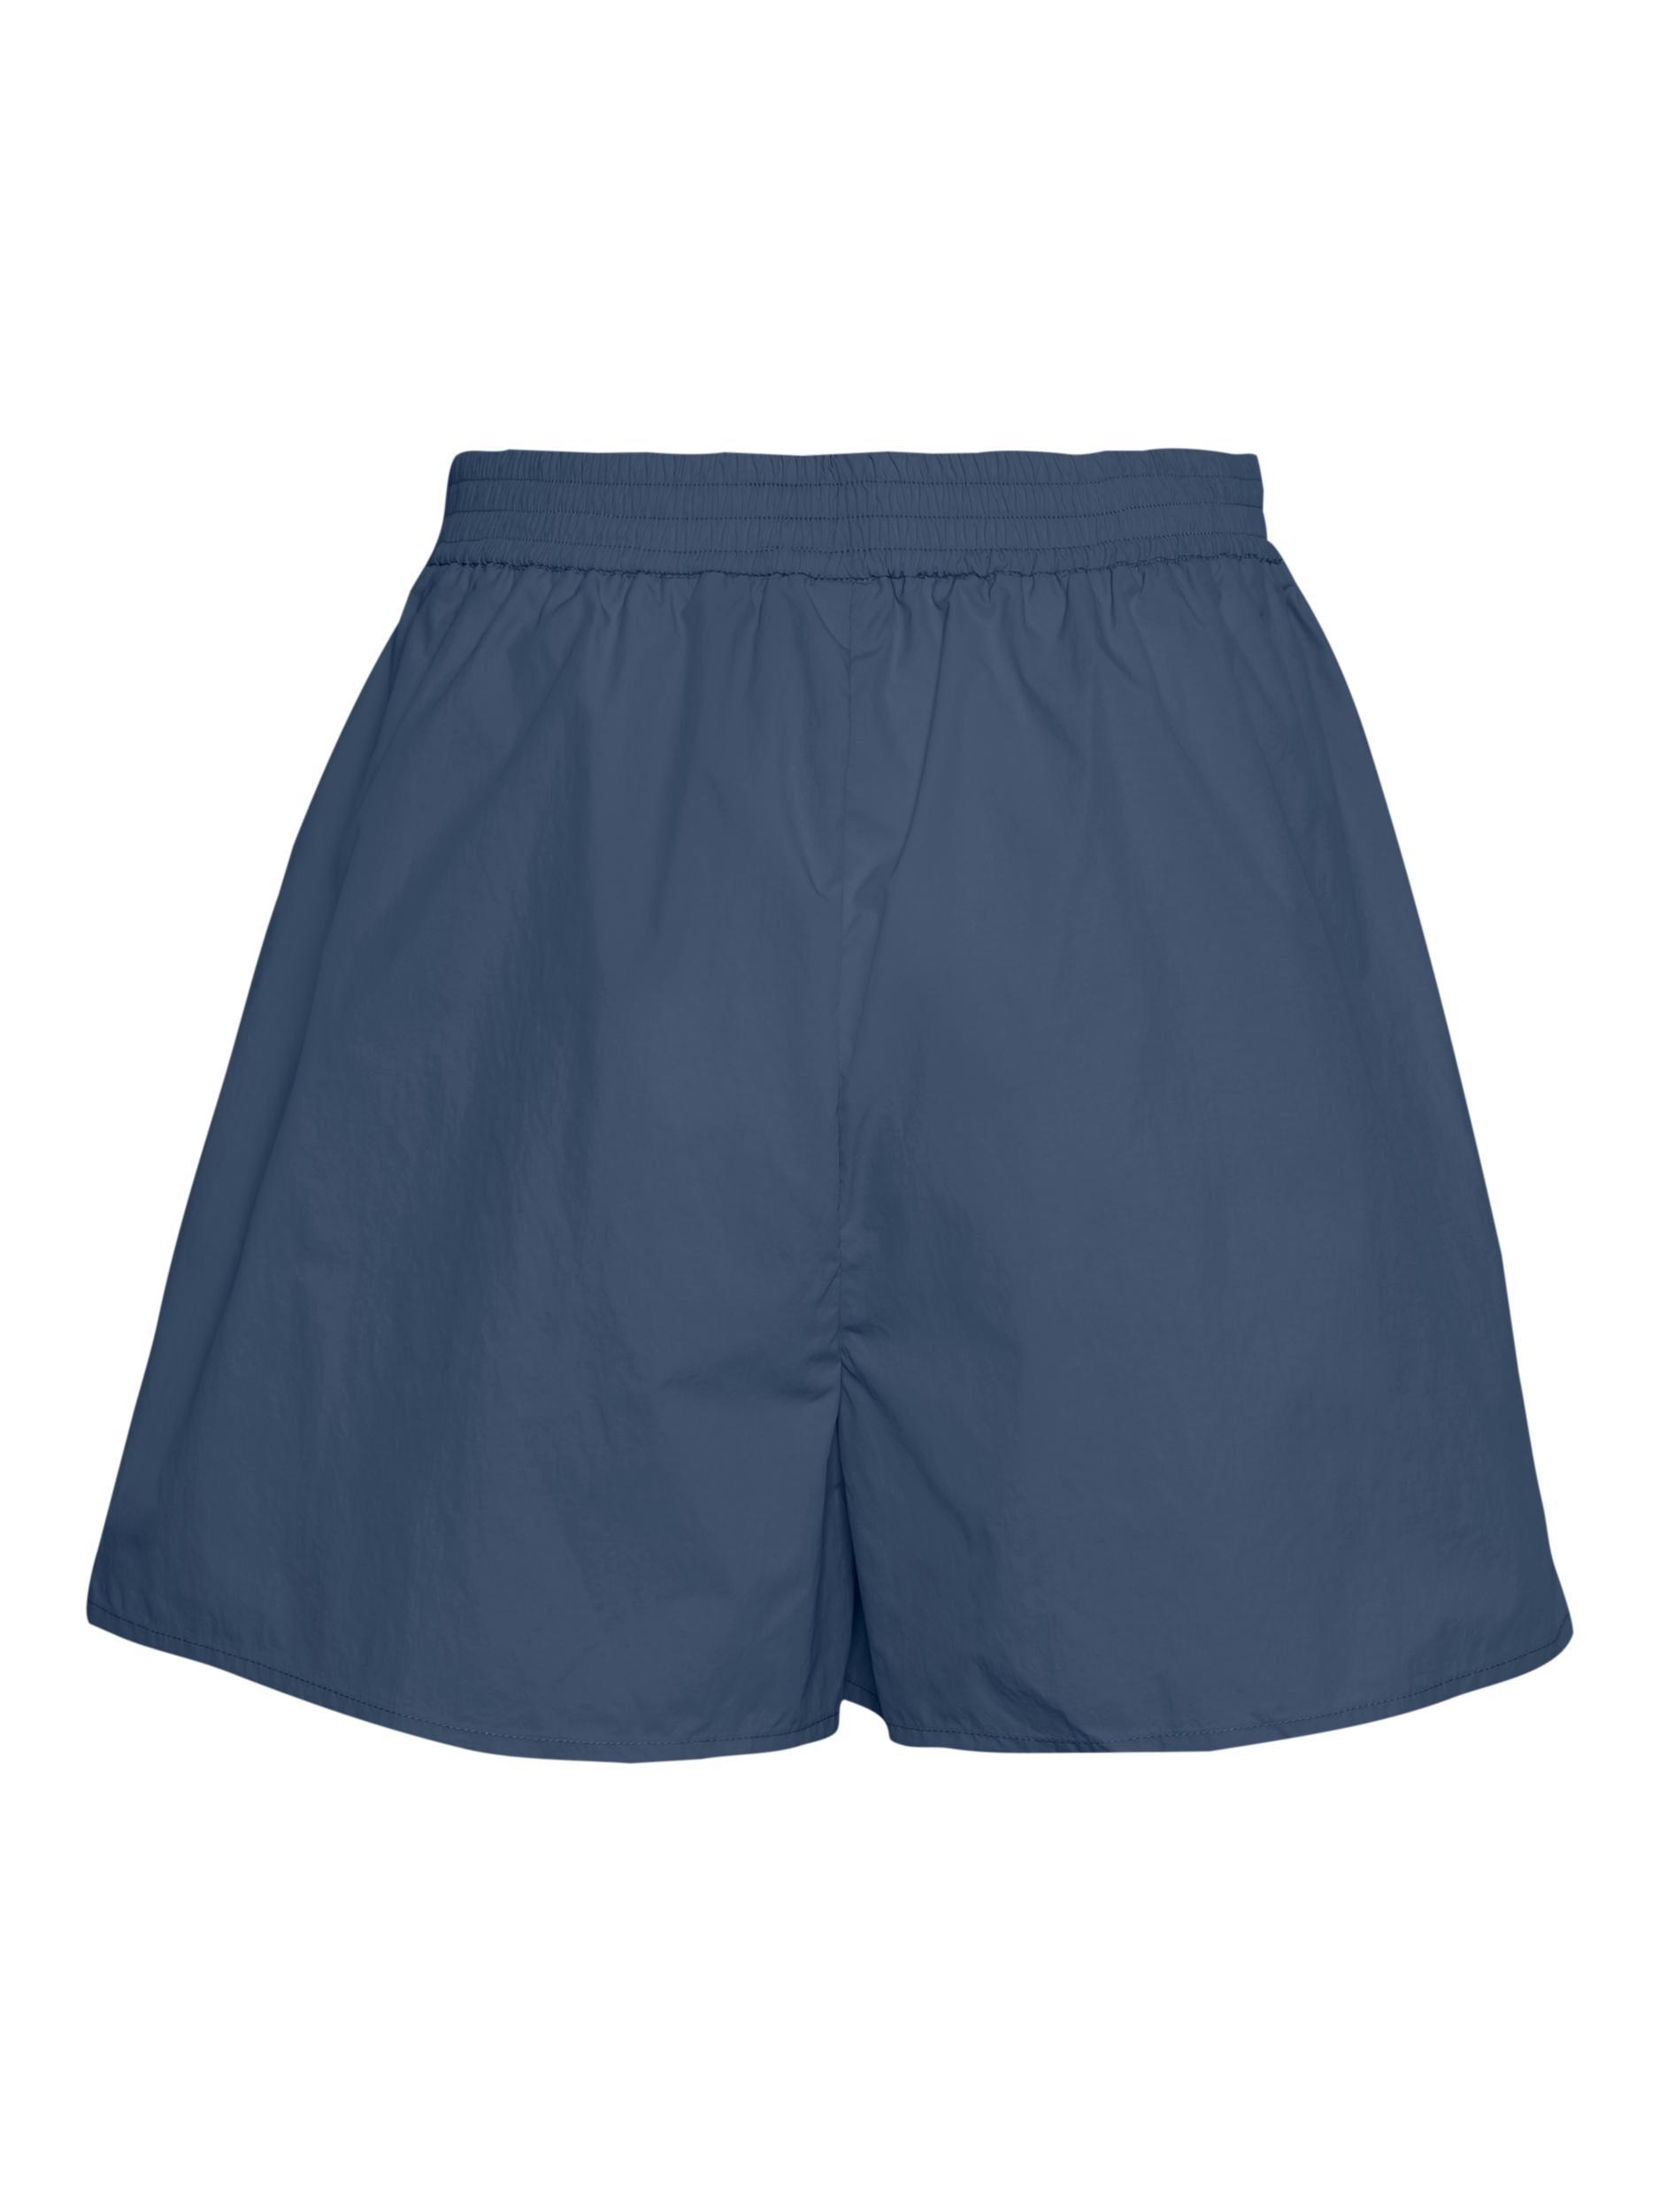 Vero Moda Oislay shorts, vintage indigo, medium